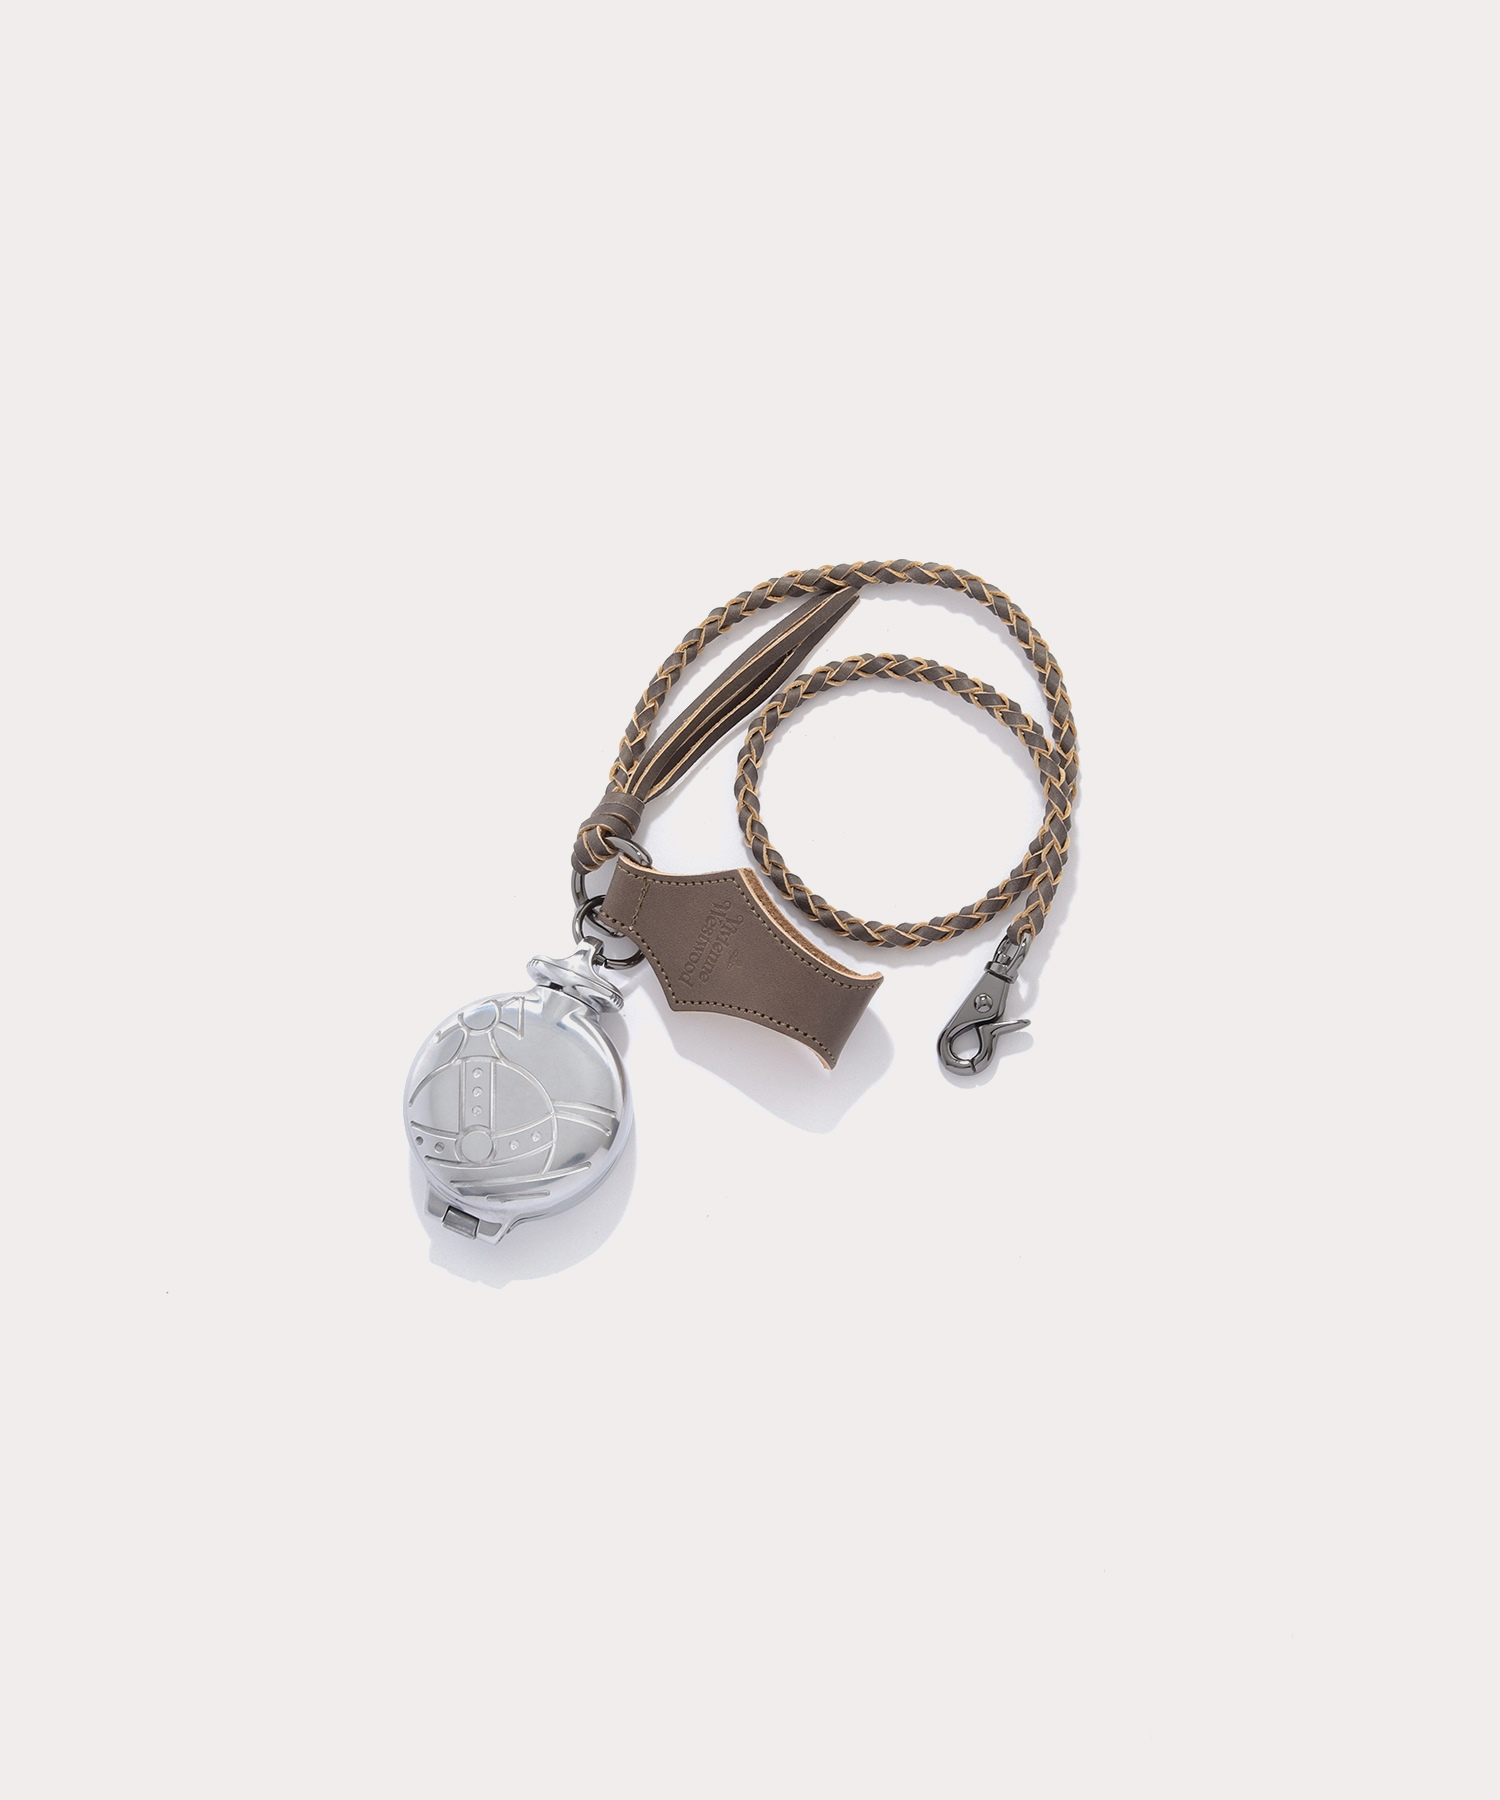 BIG ORB ラウンド携帯灰皿